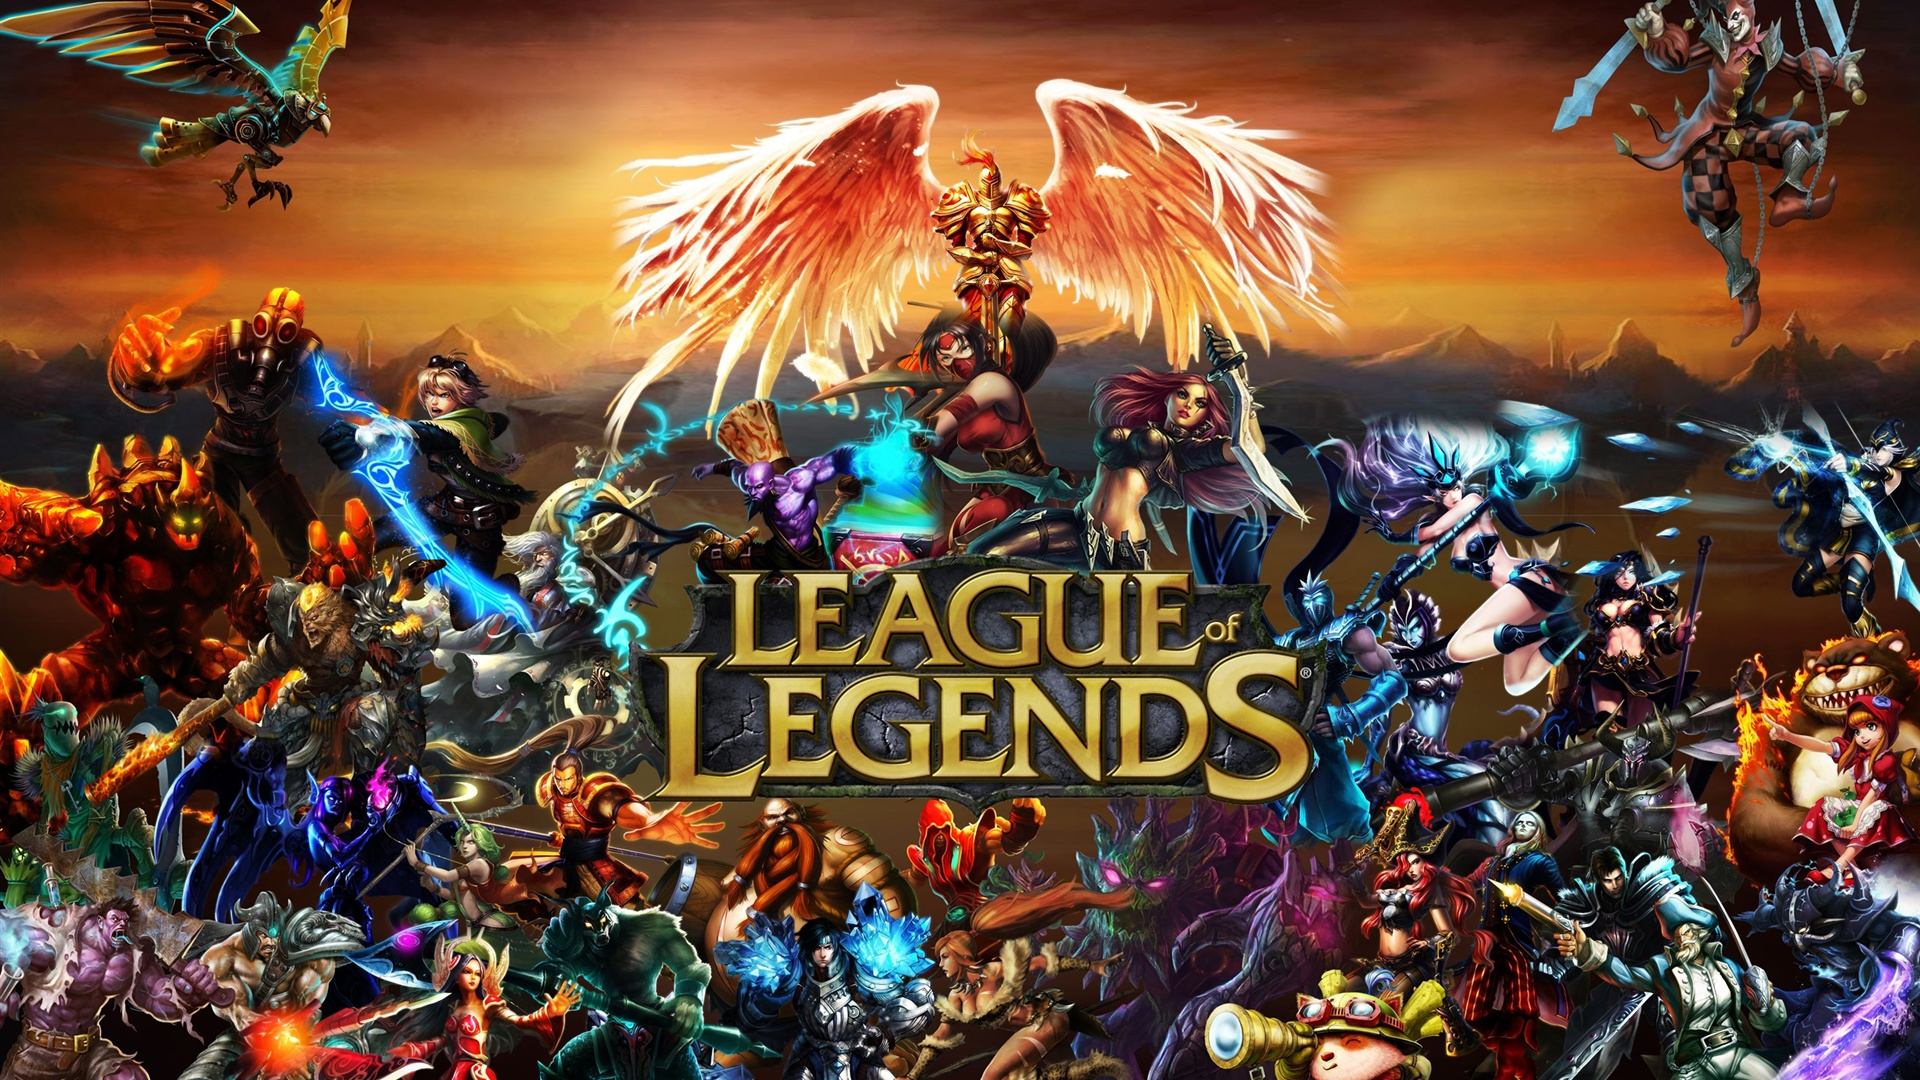 League Of Legends Wallpaper For Android ~ Sdeerwallpaper